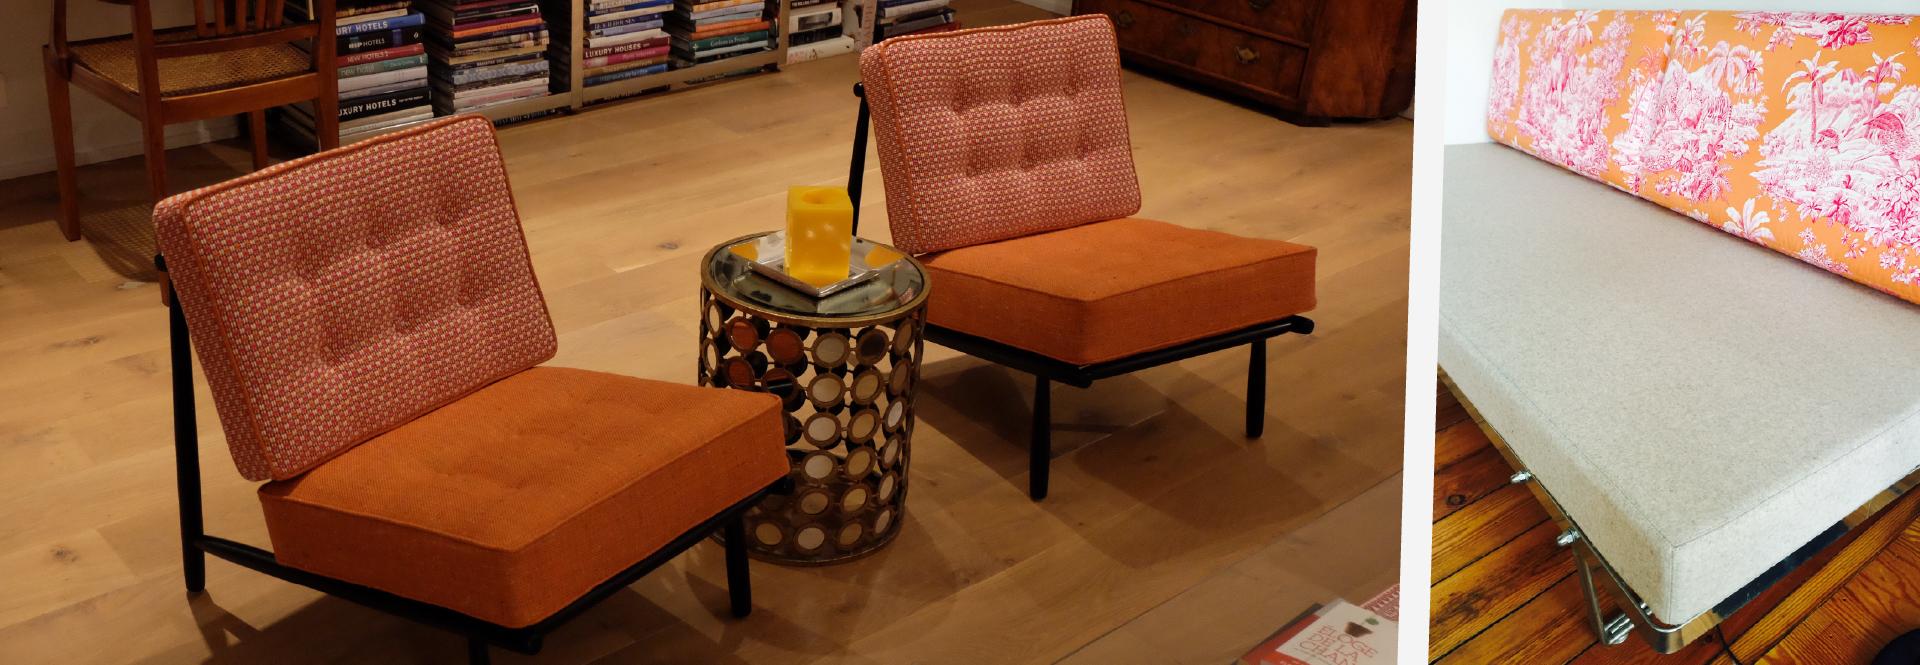 Garnissage mobilier contemporain